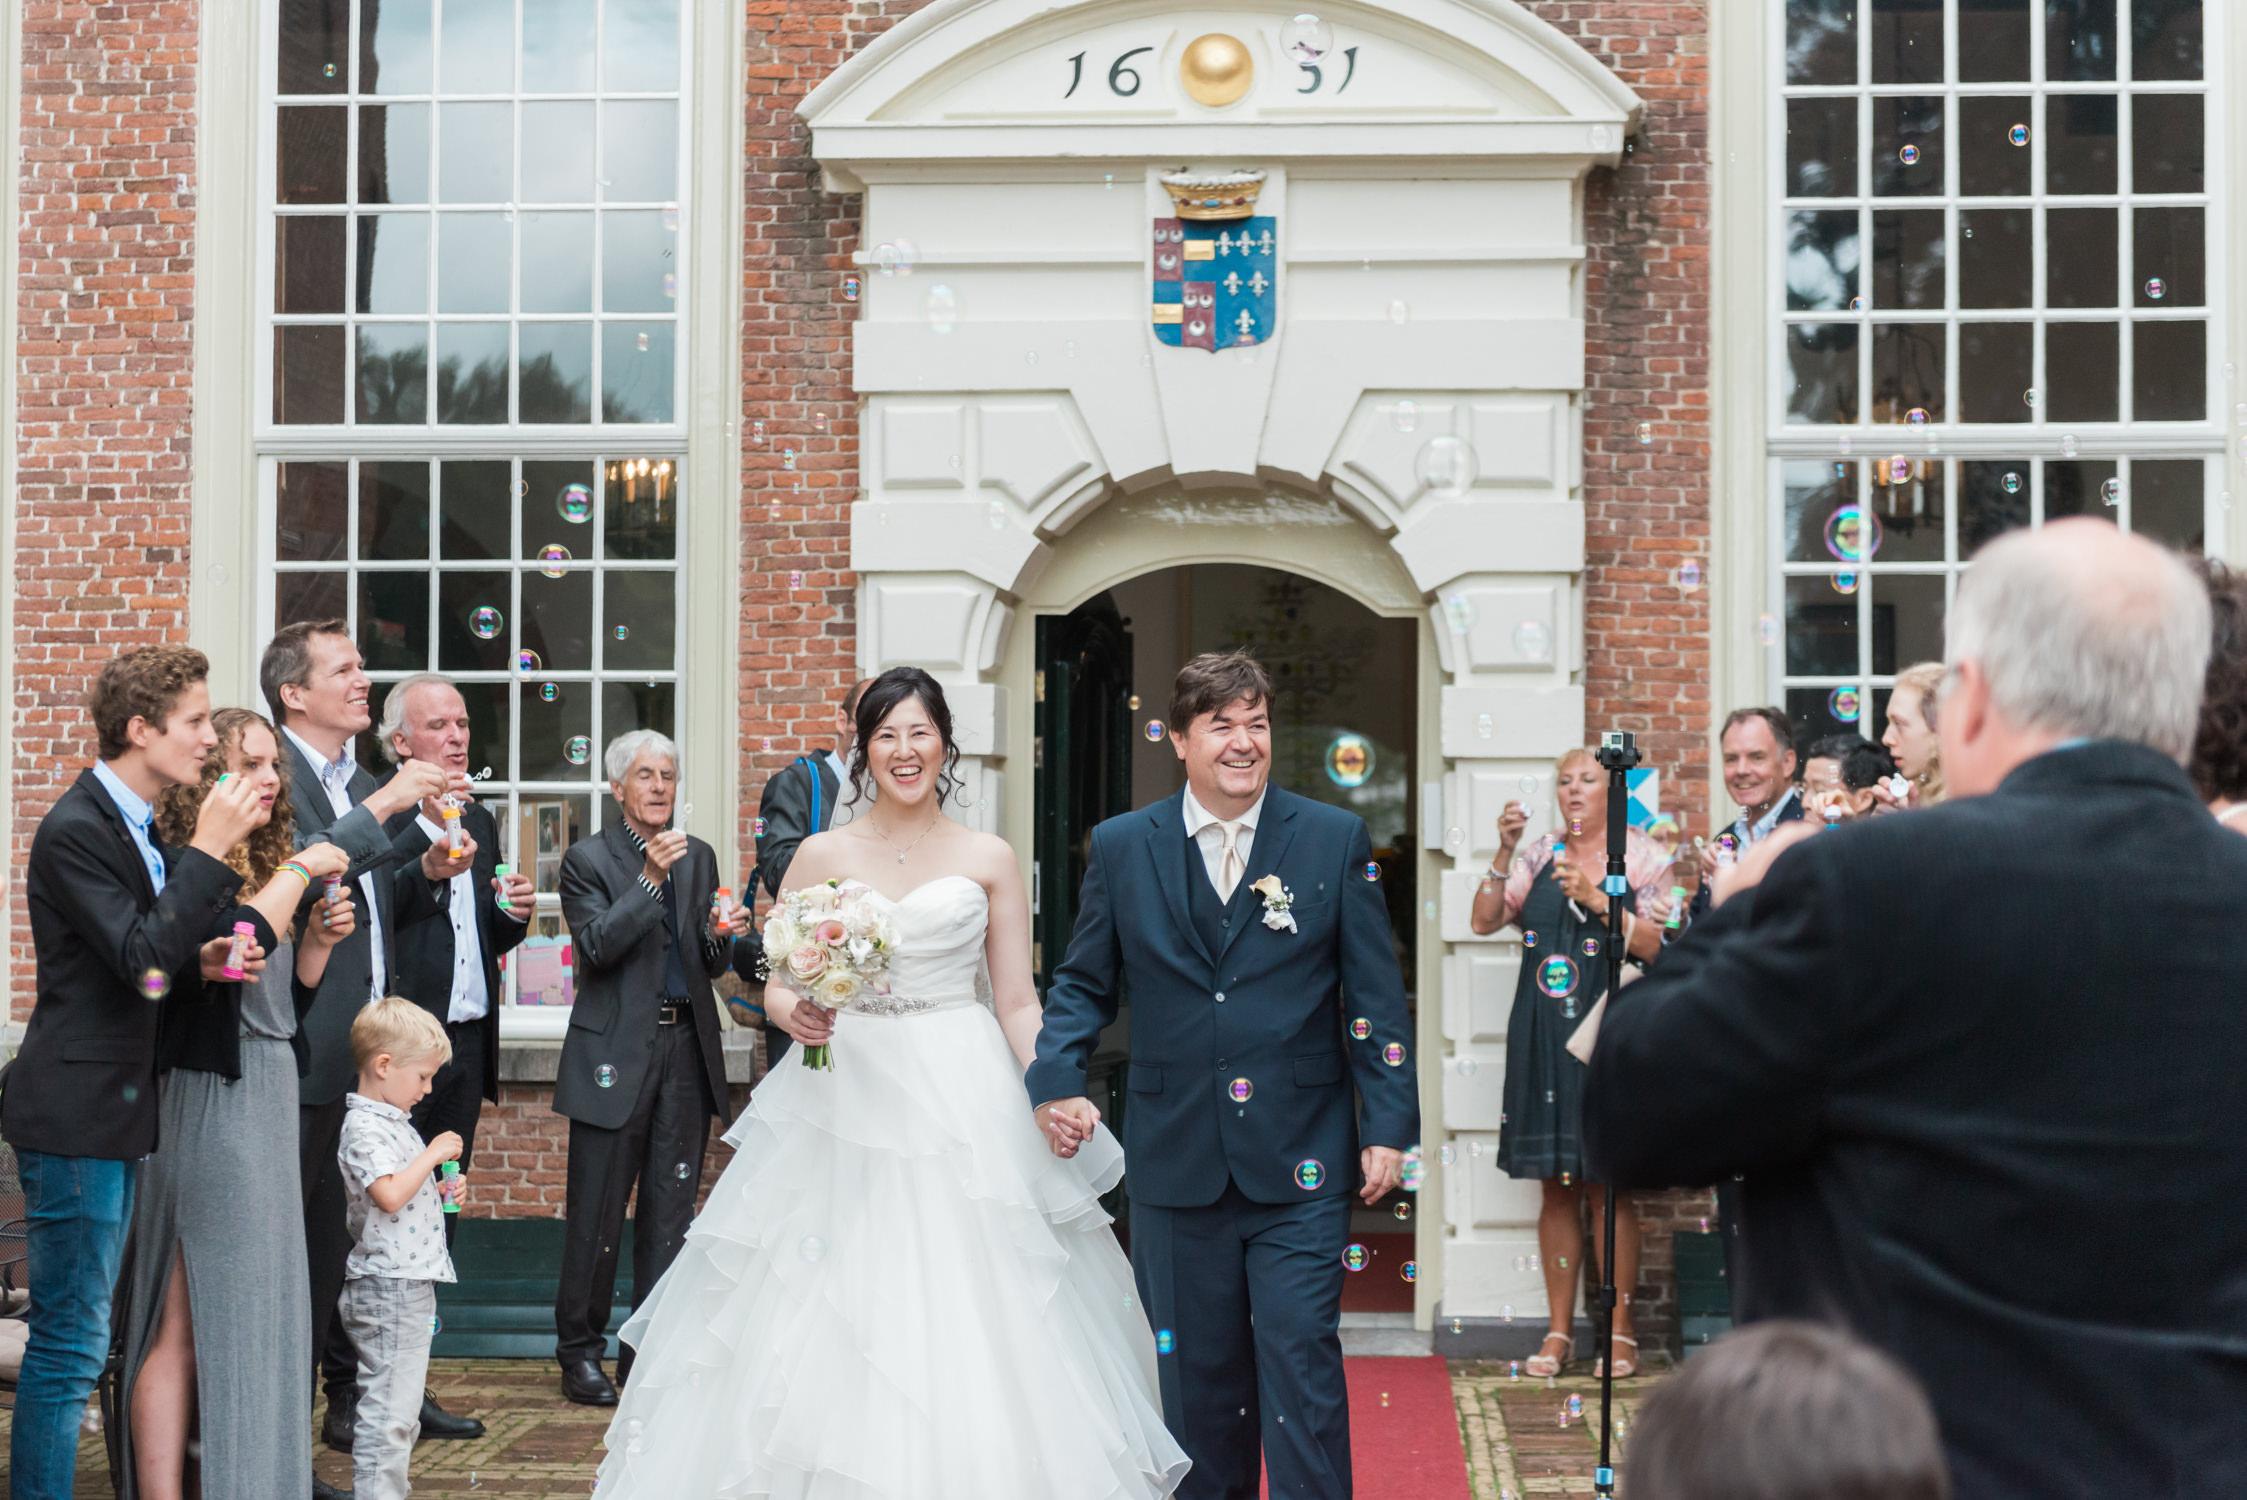 den-haag-wedding-photography-the-hague-43